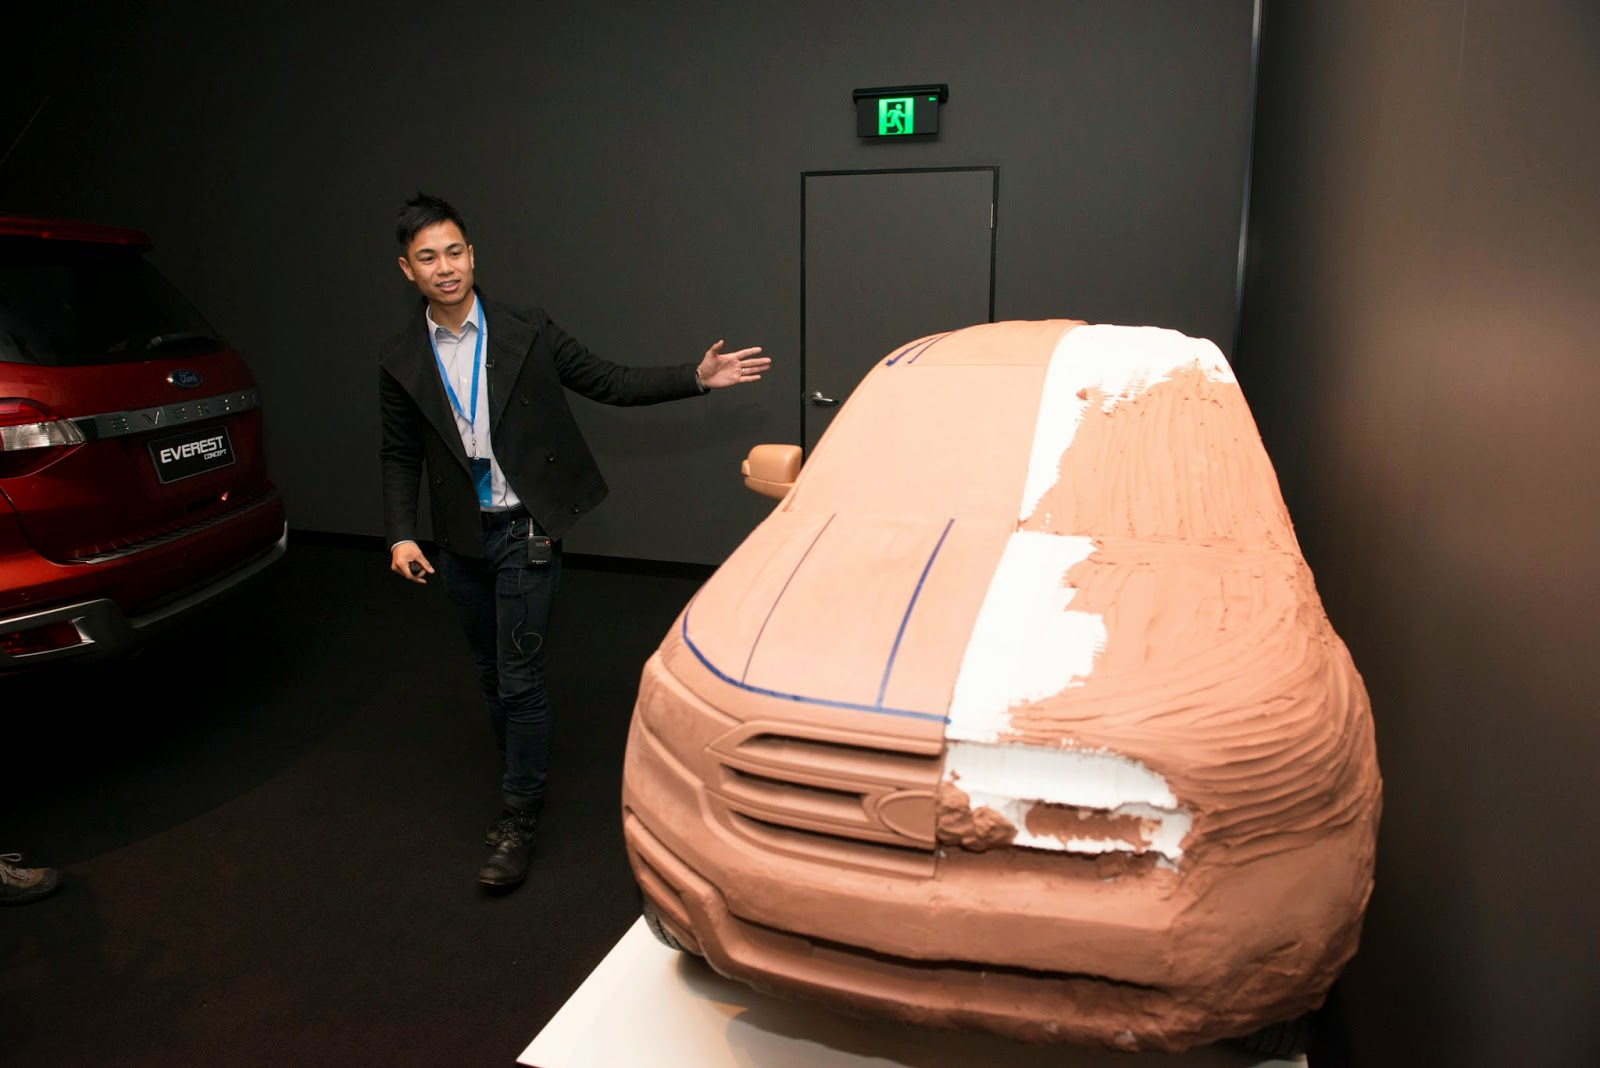 Sistem Pembangunan Antarabangsa dan Kepakaran SUV Ford Mendasari Penghasilan SUV Global Serba Baharu